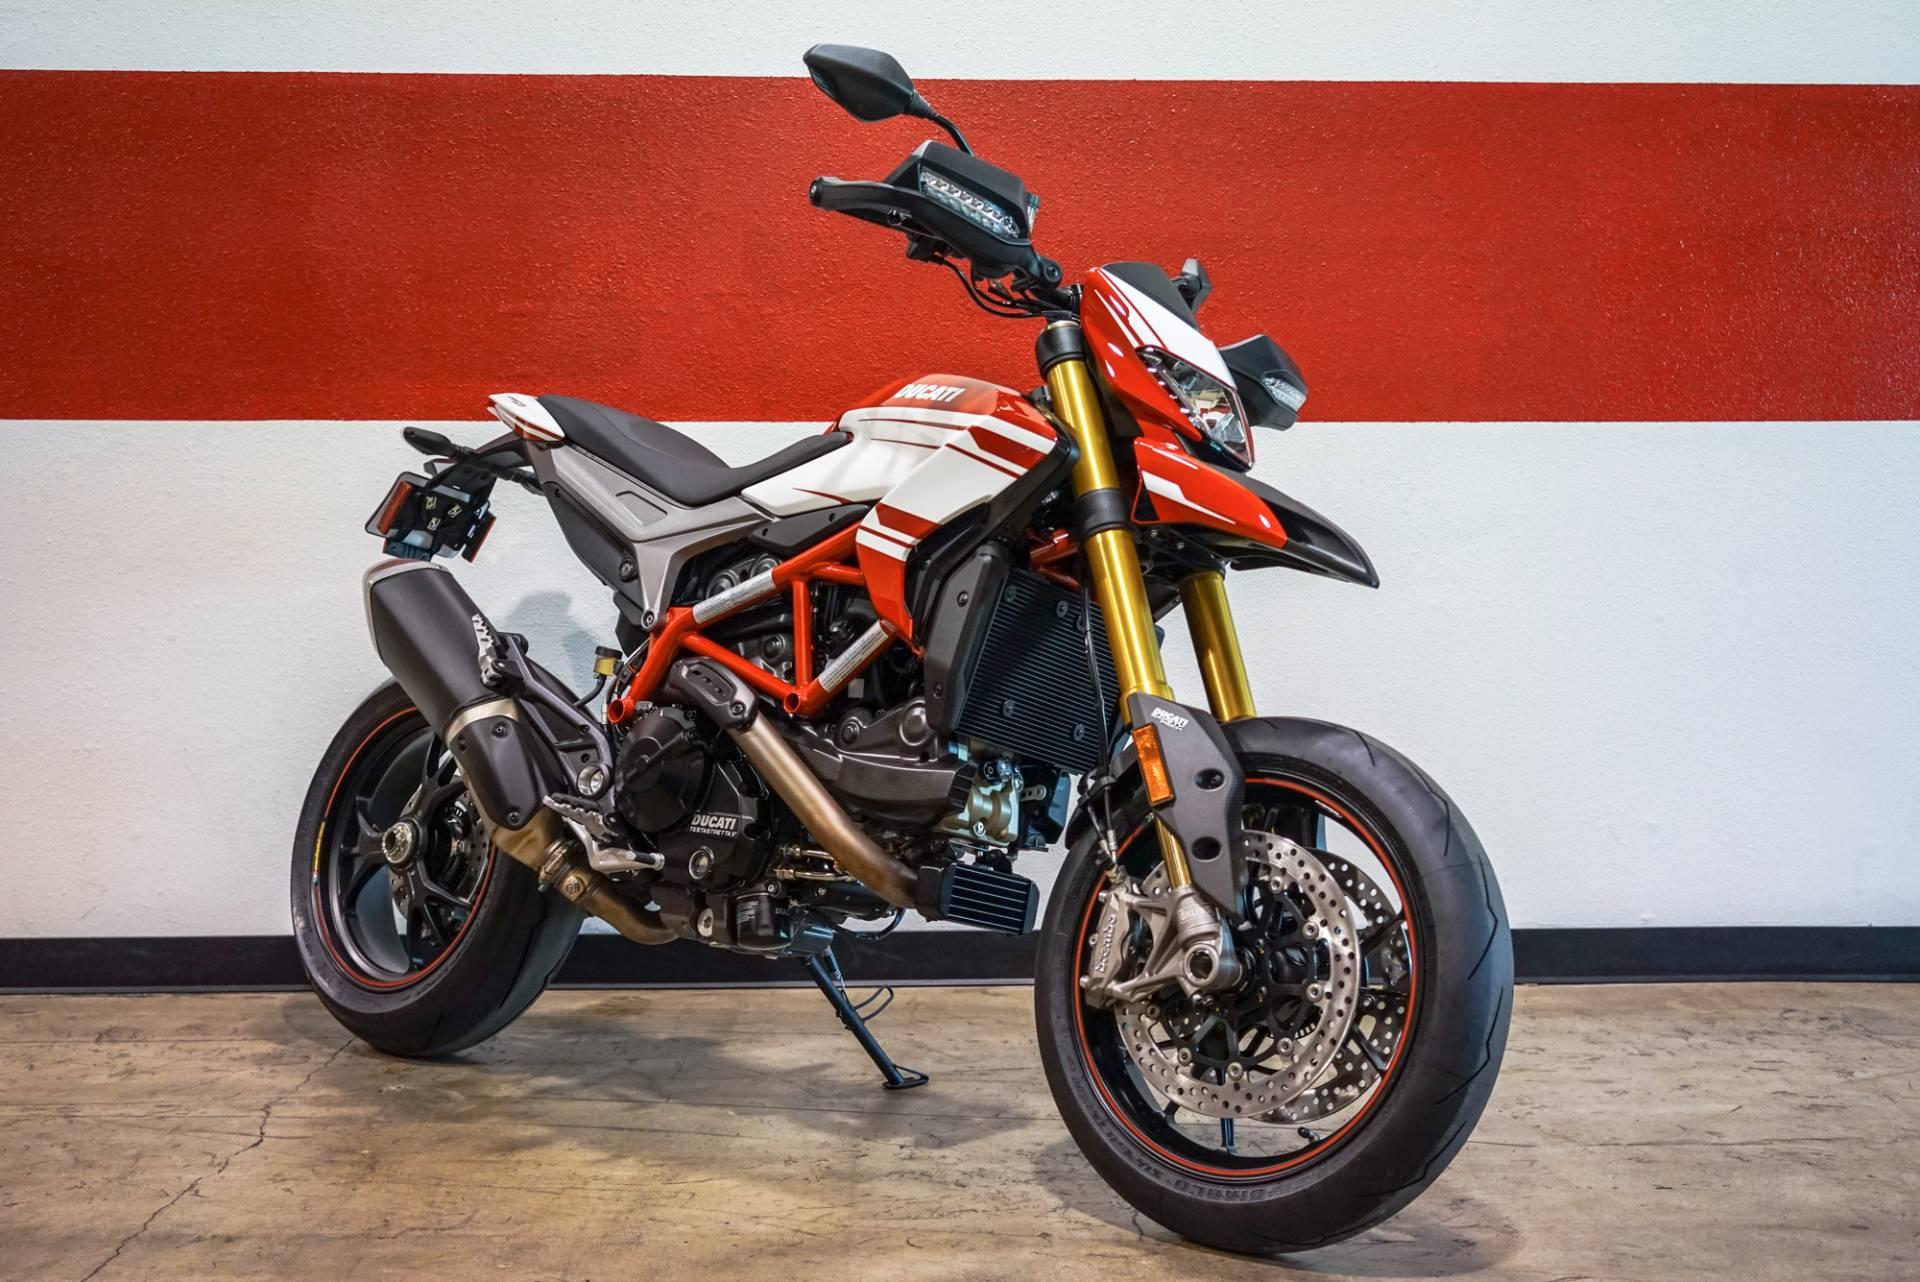 2017 Ducati Hypermotard 939 SP in Brea, California